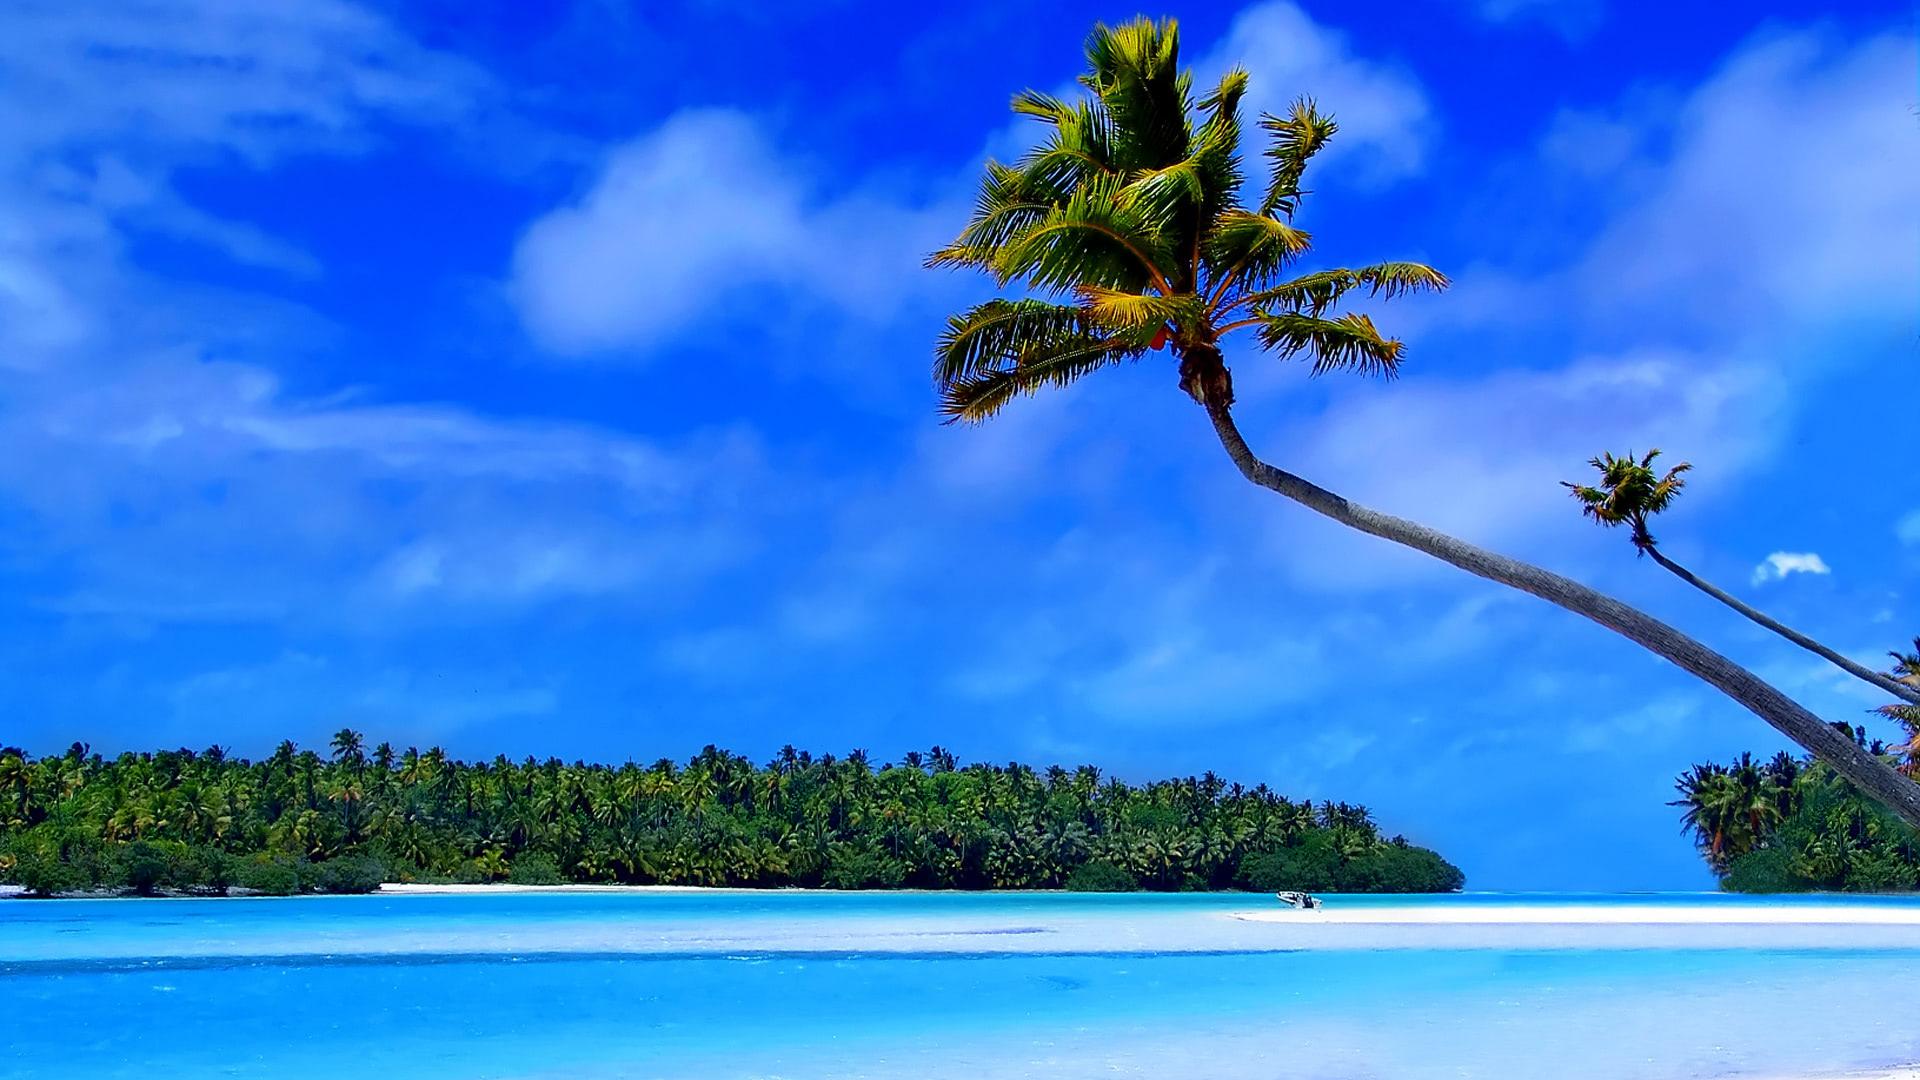 The caribbean islands wallpaper beach wallpapers - Caribbean wallpaper free ...